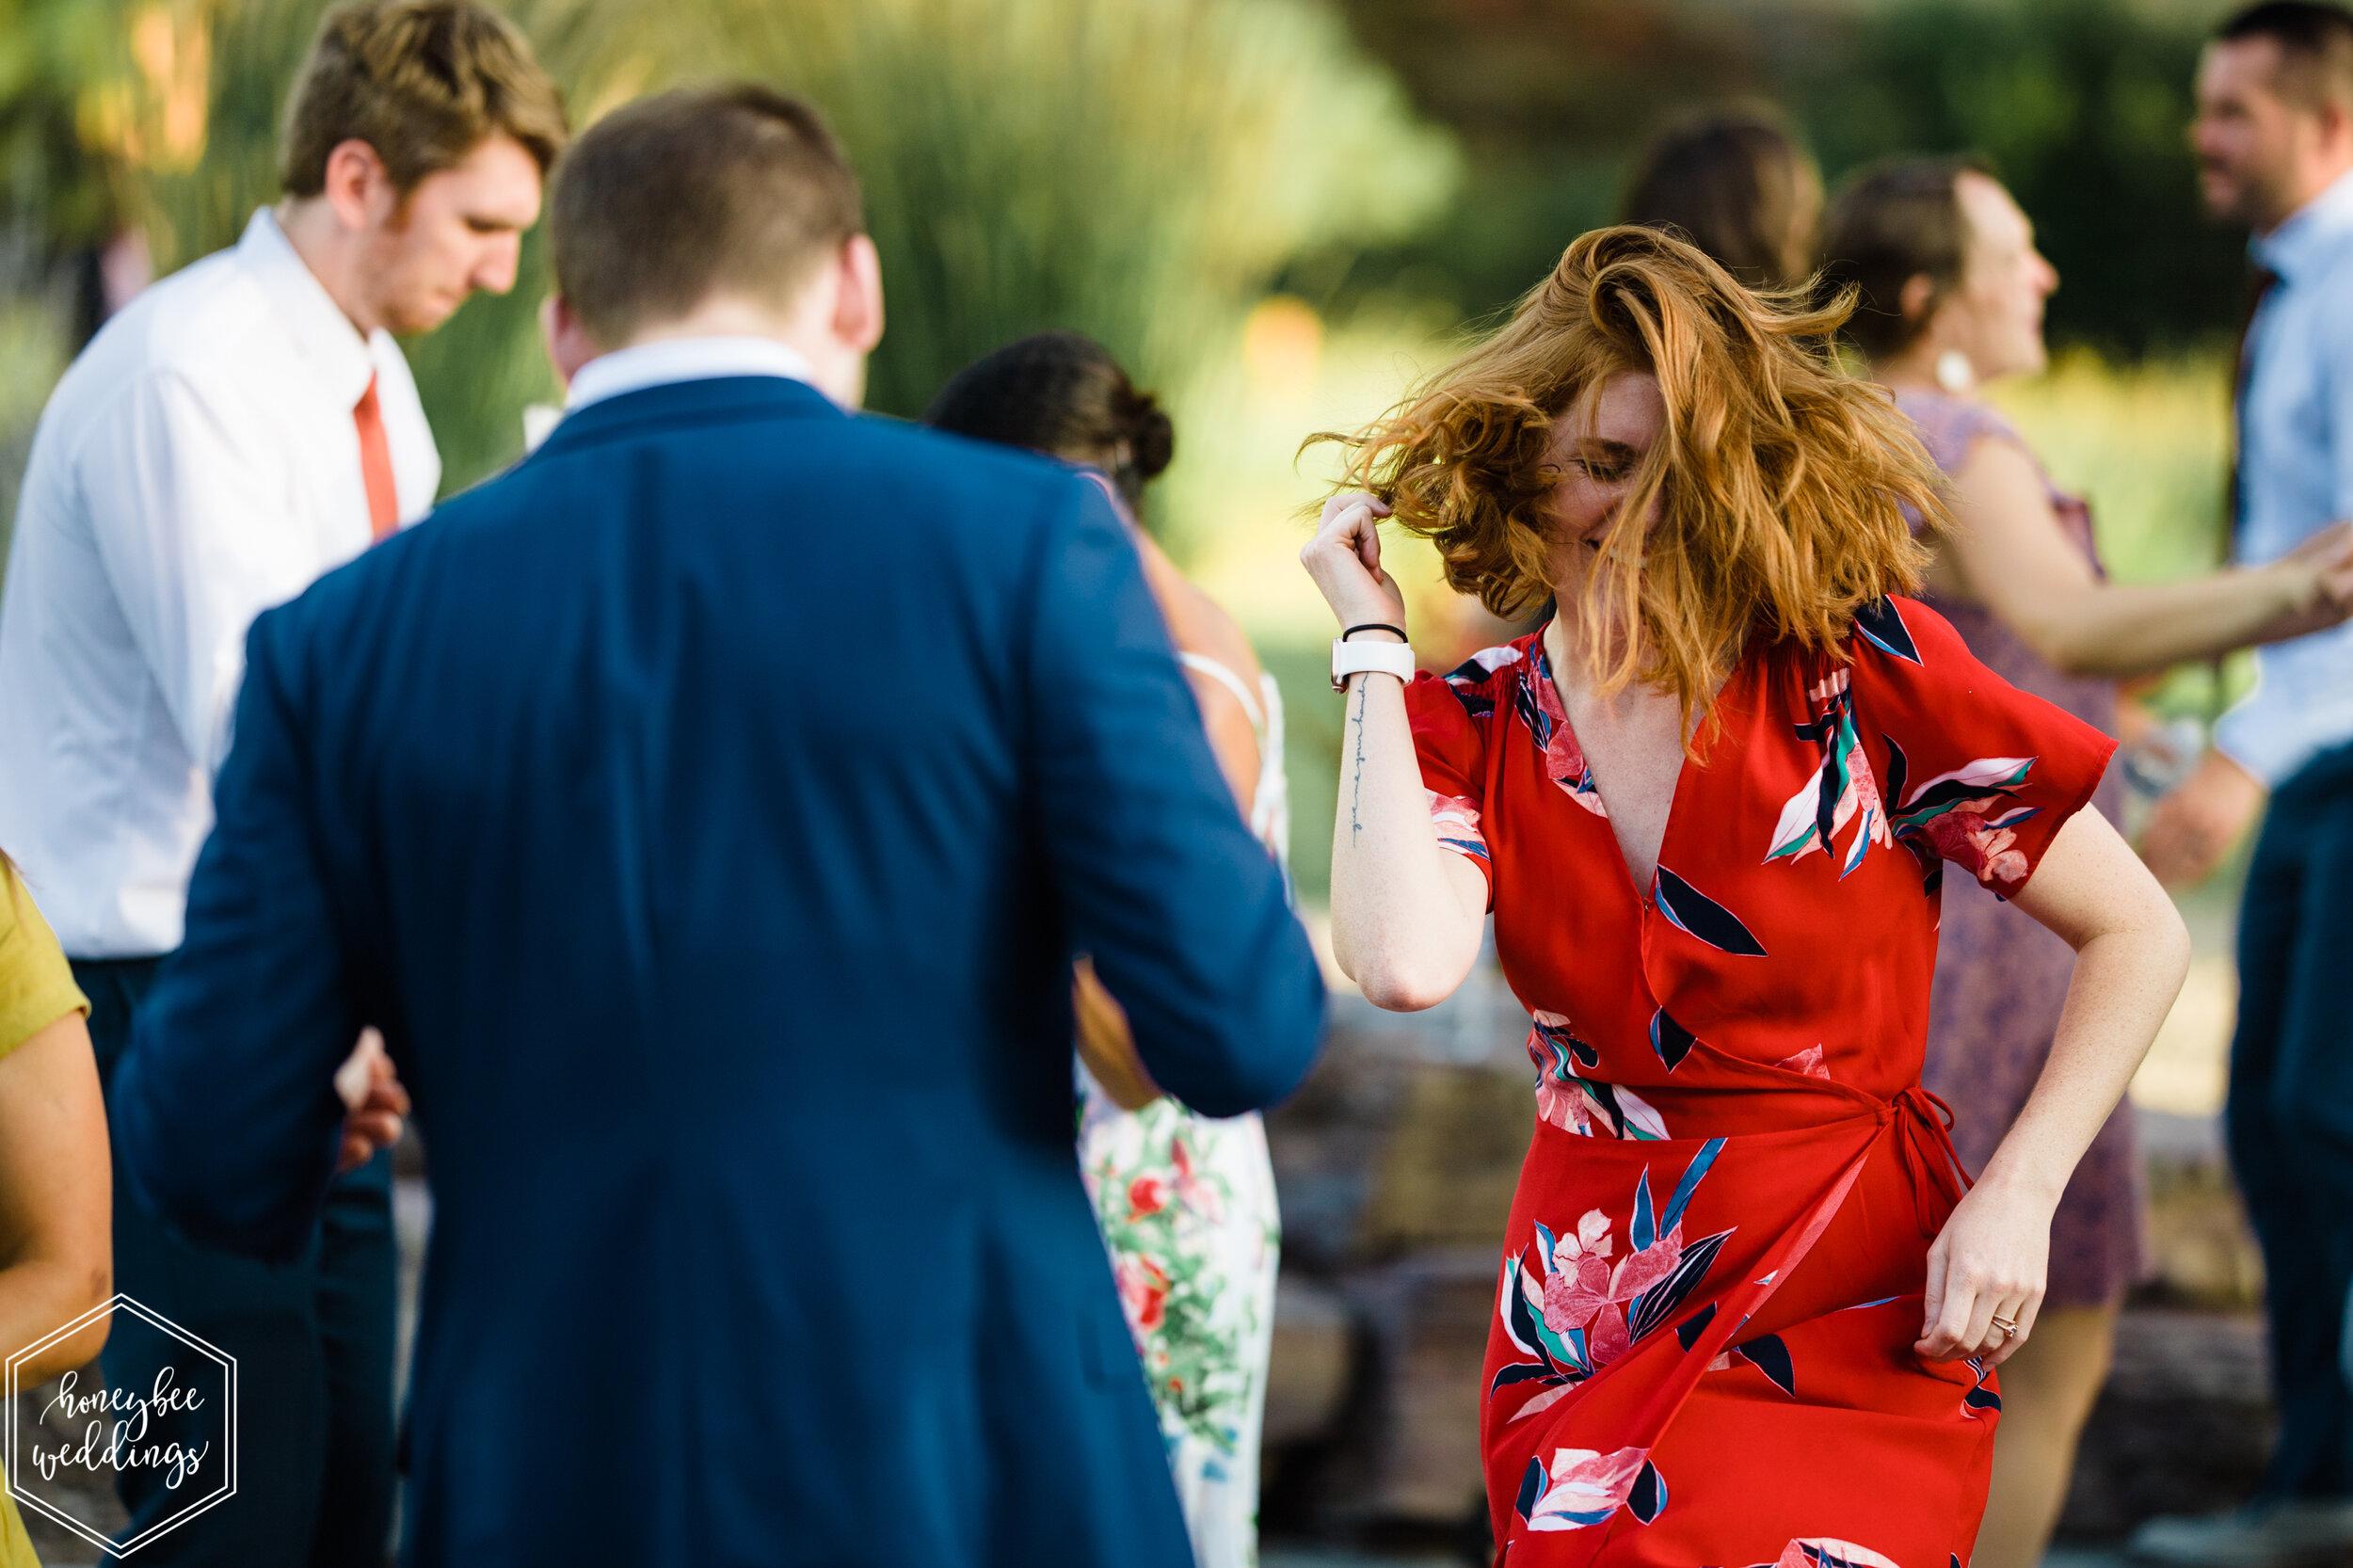 217White Raven Wedding_Montana Wedding Photographer_Rebekah & Likom_Honeybee Weddings_July 27, 2019-2336.jpg